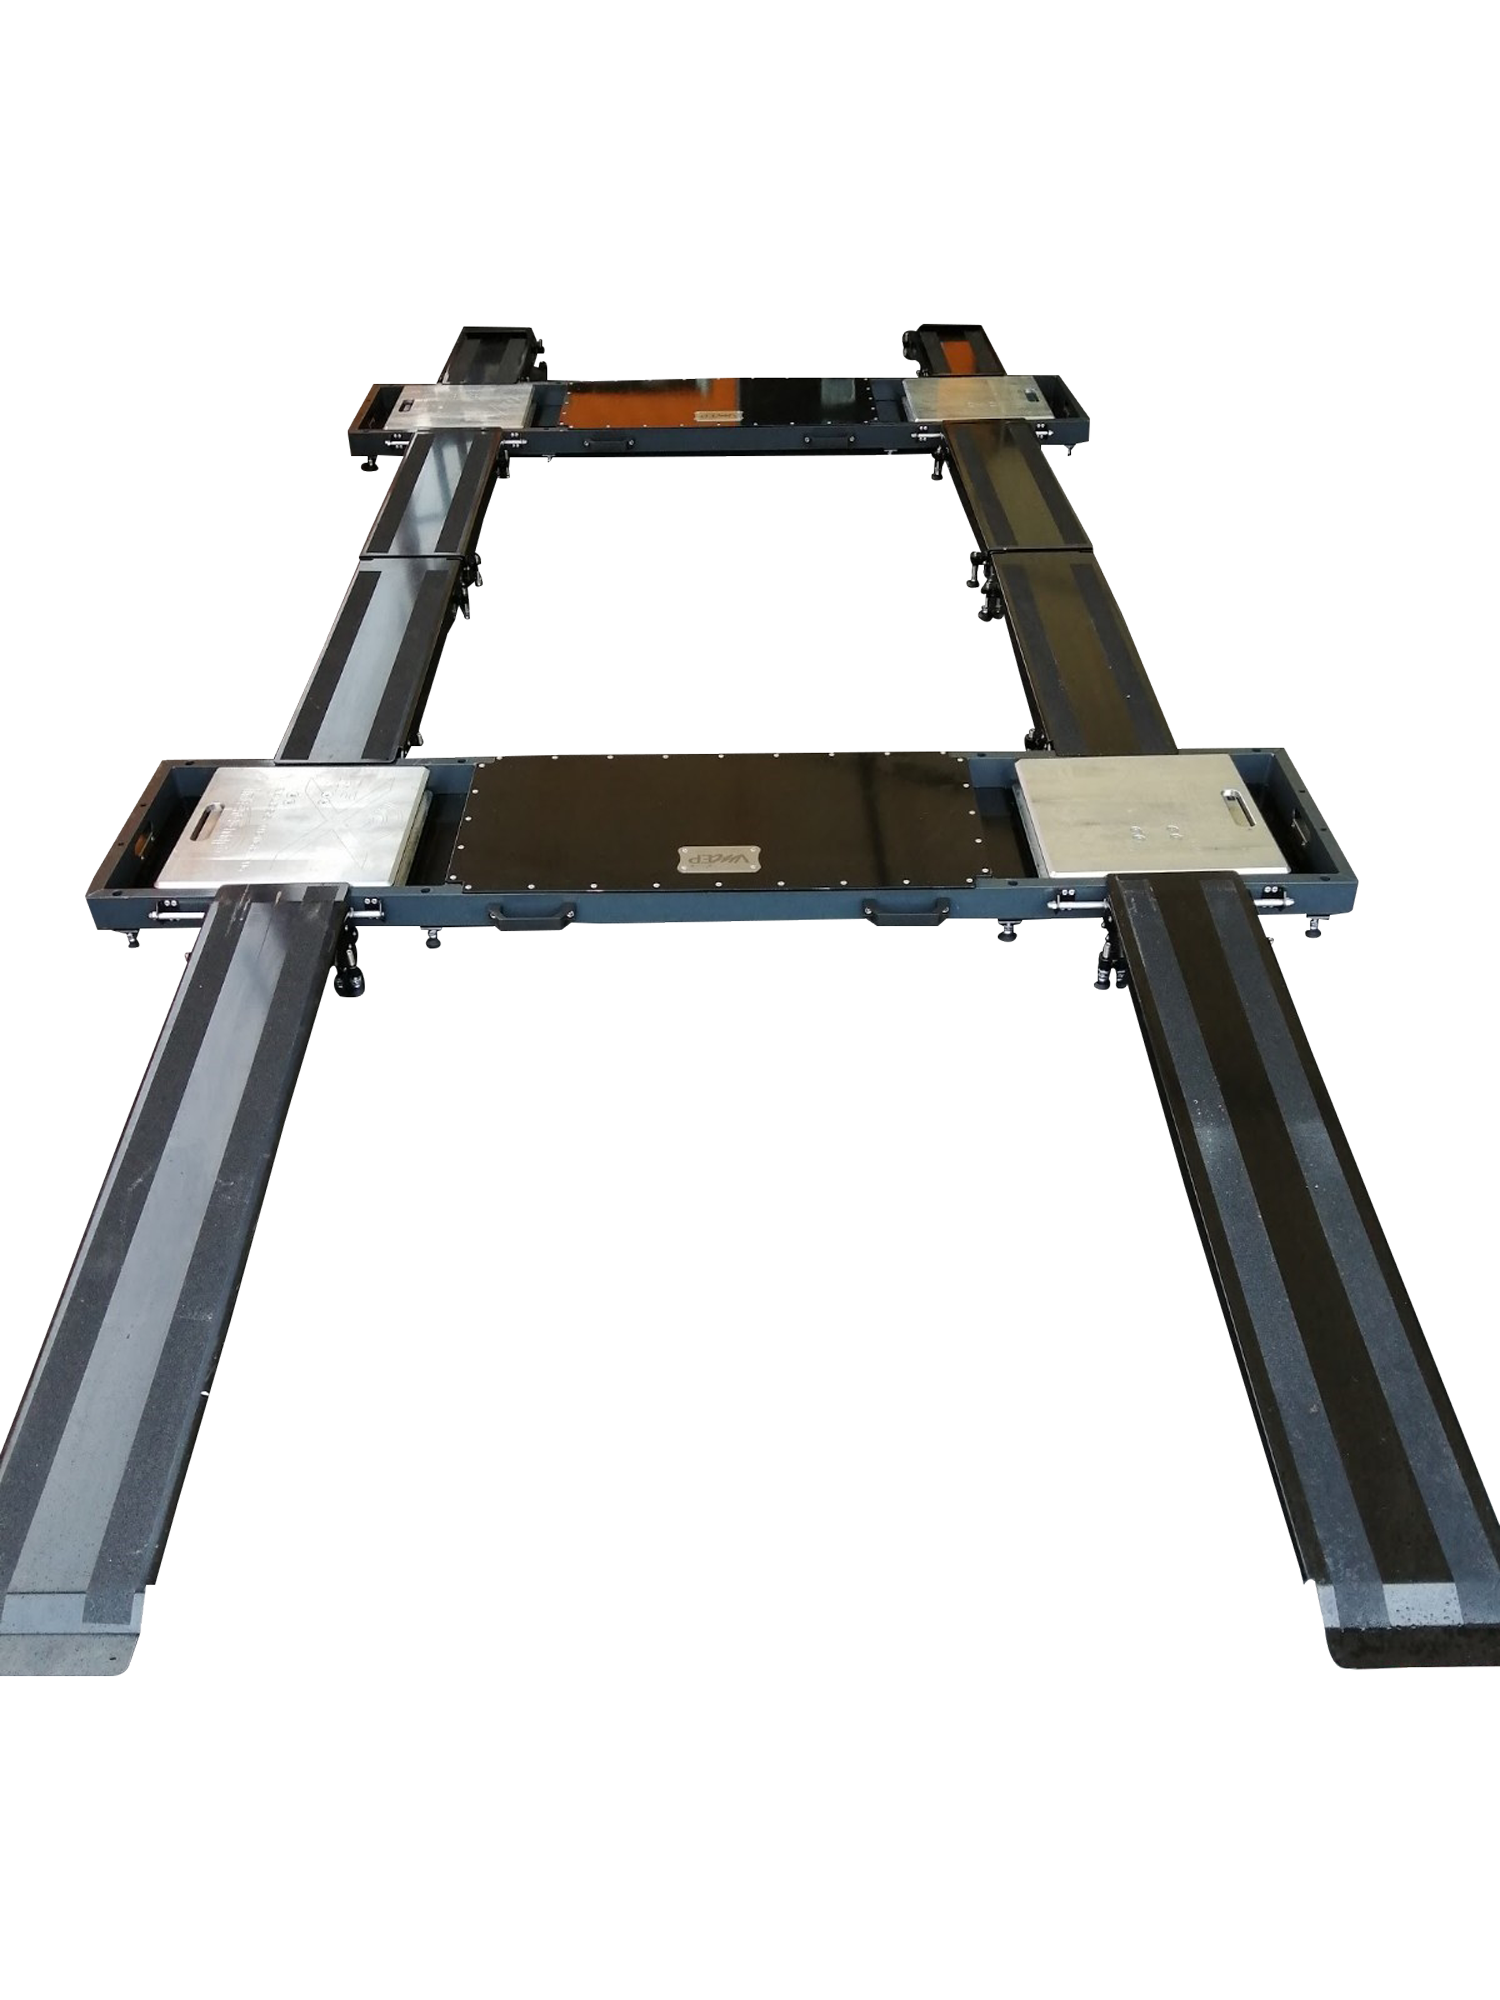 Intercomp set up rack